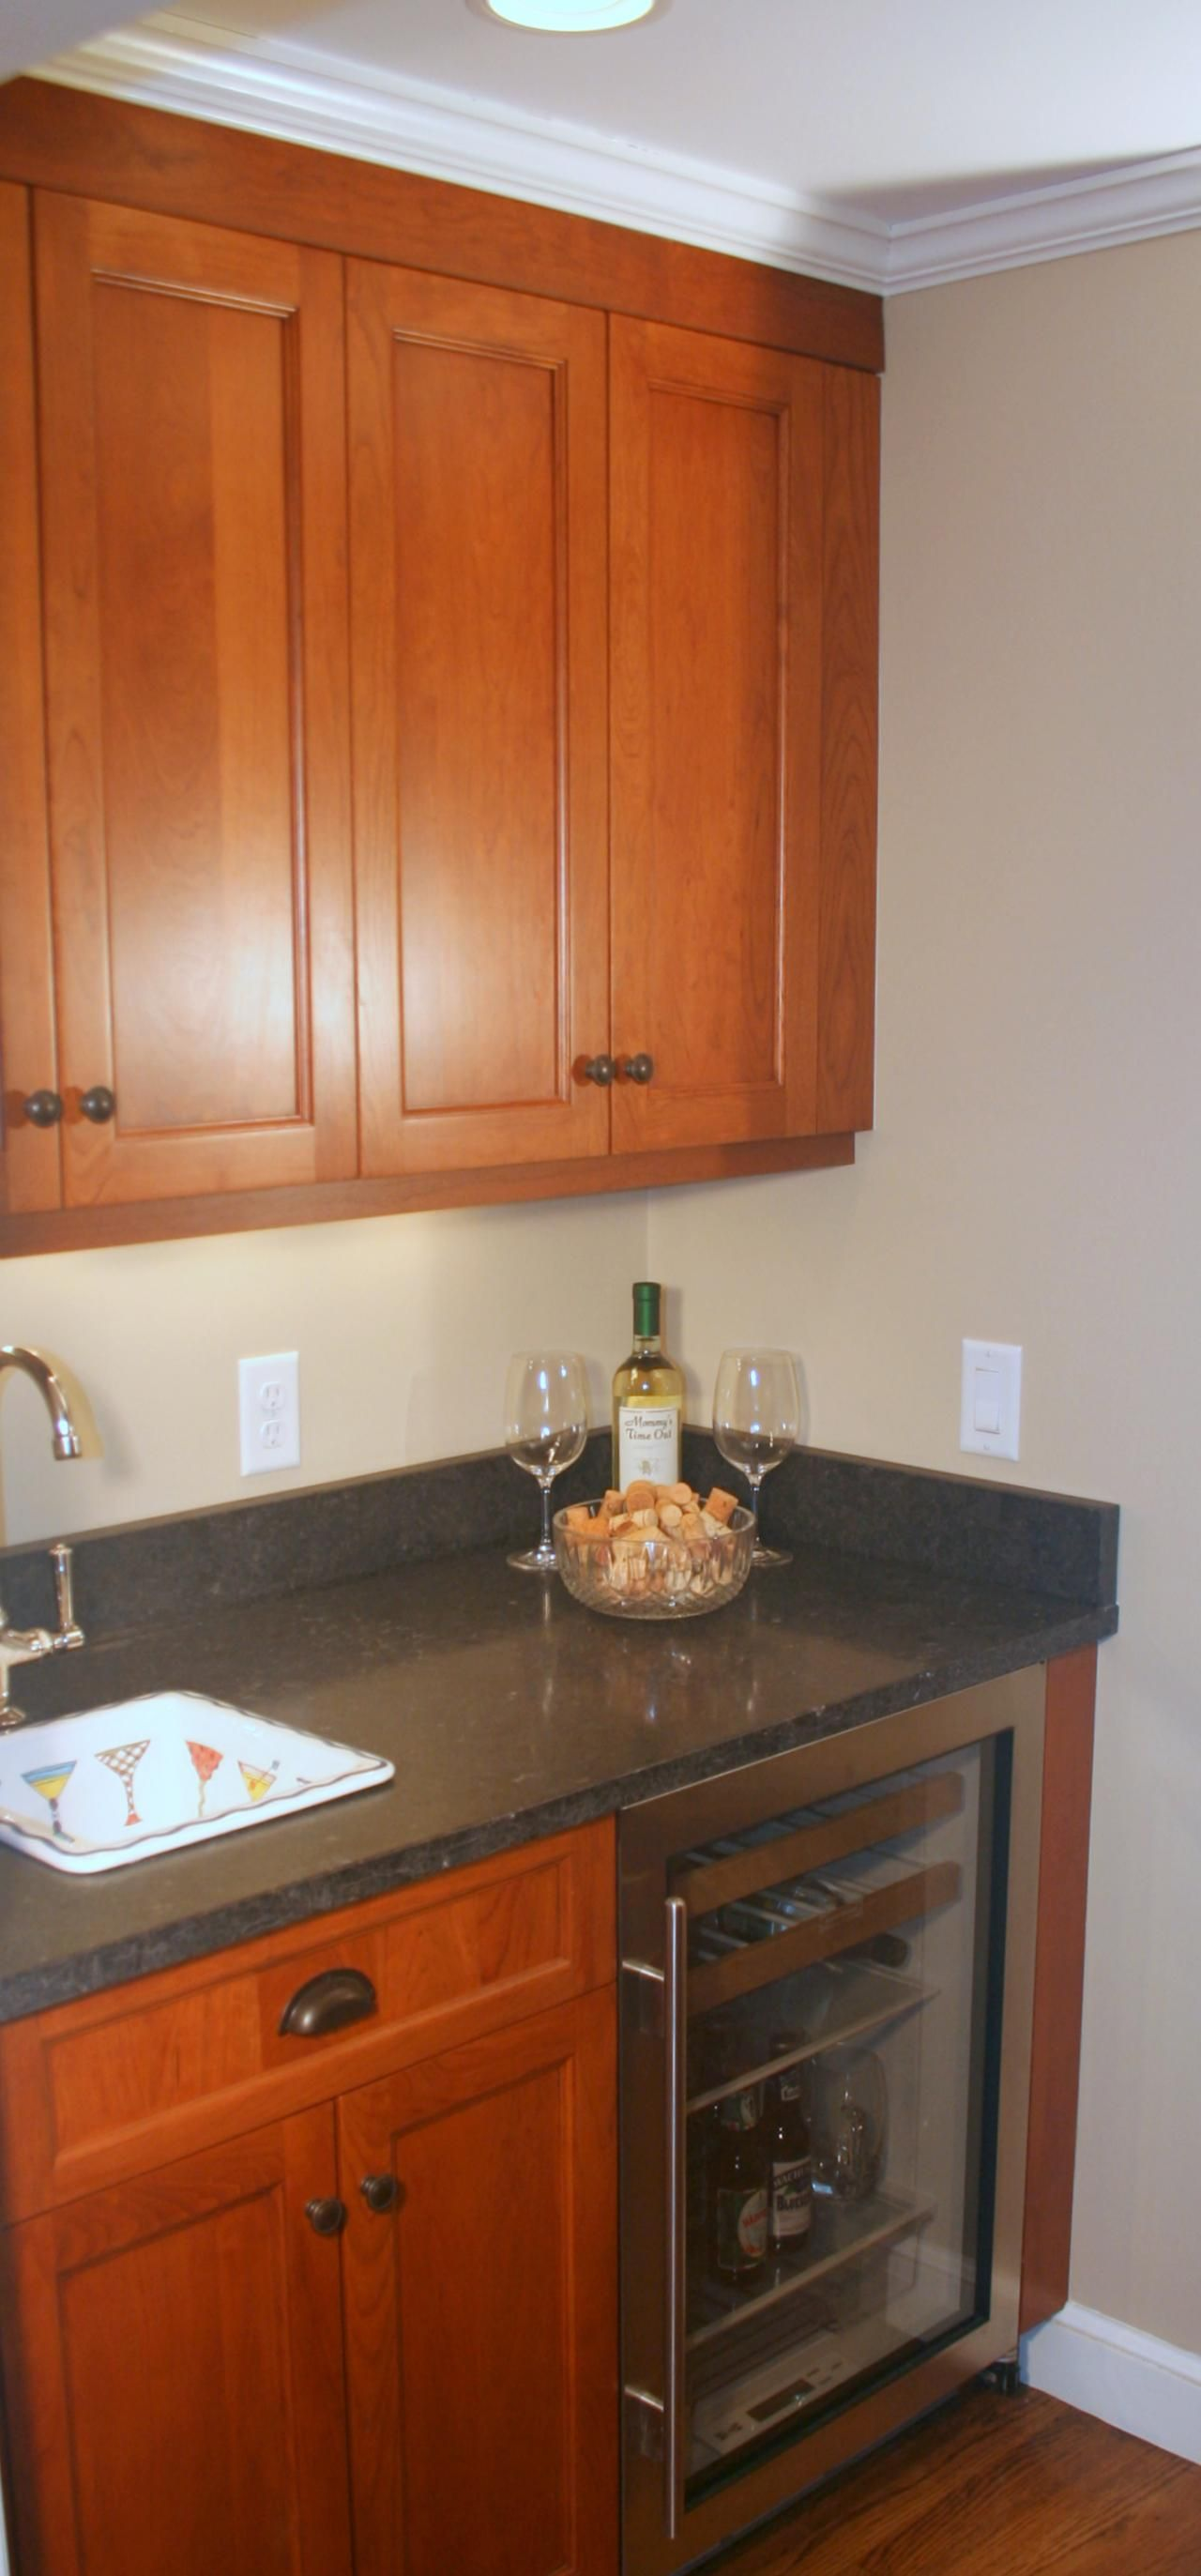 Sink Wall Side Of Wet Bar Kitchen Display Kitchen And Bath Design Cool Kitchens